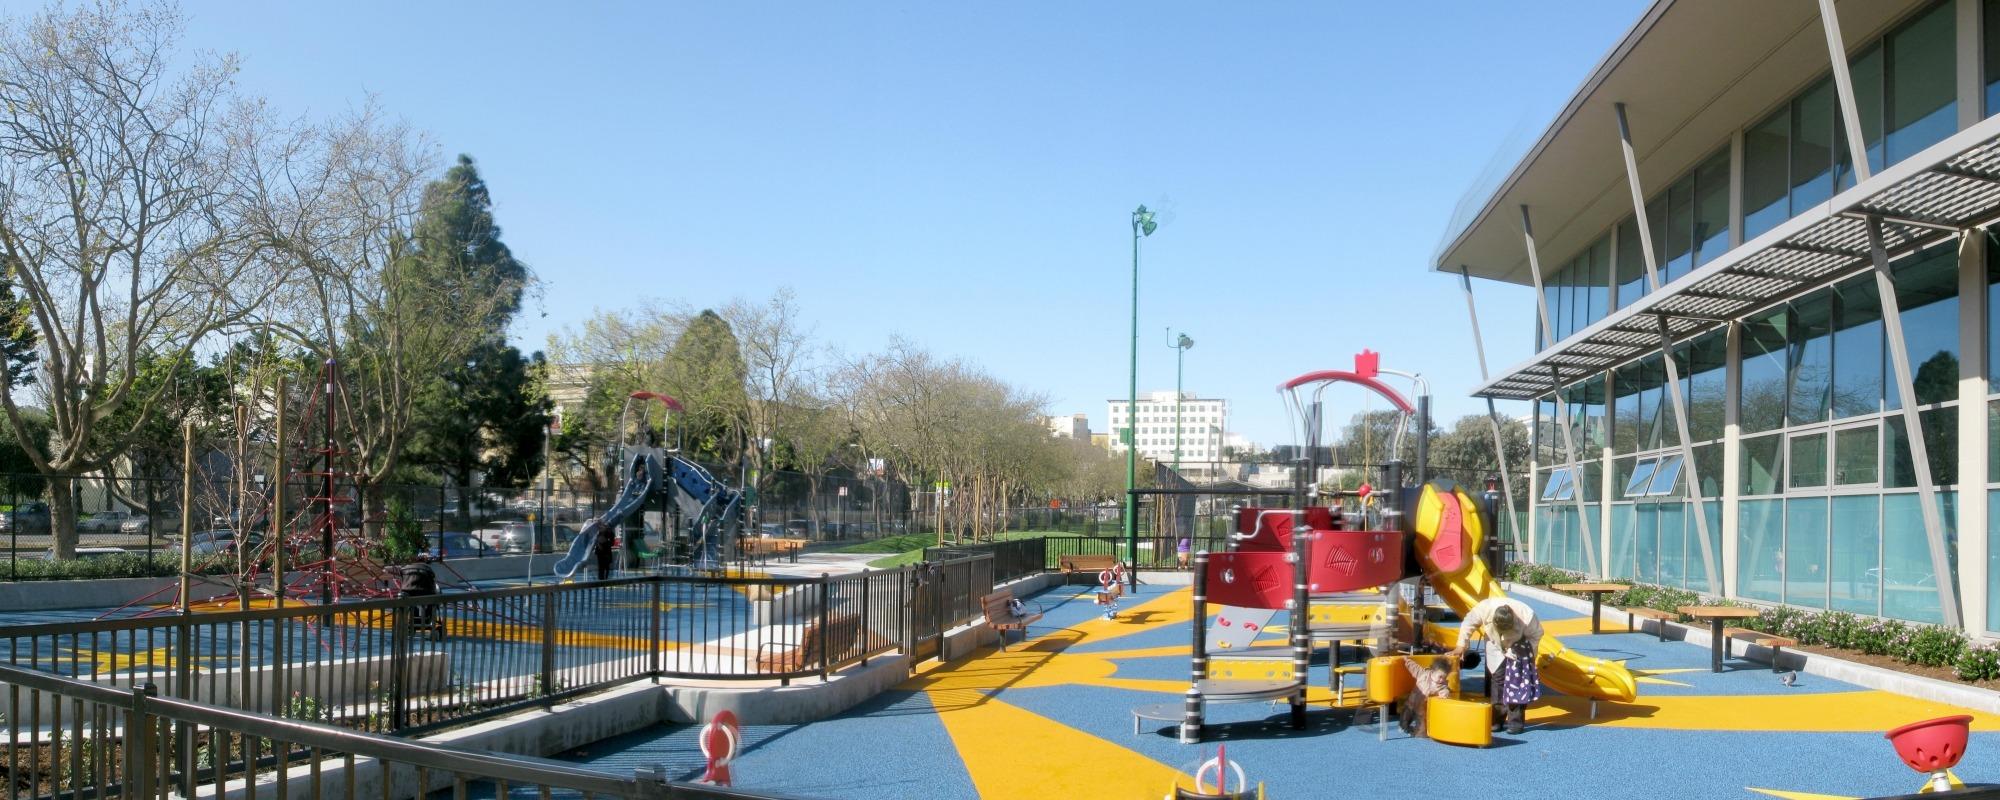 Hamilton Recreation Center & Playground Renovation